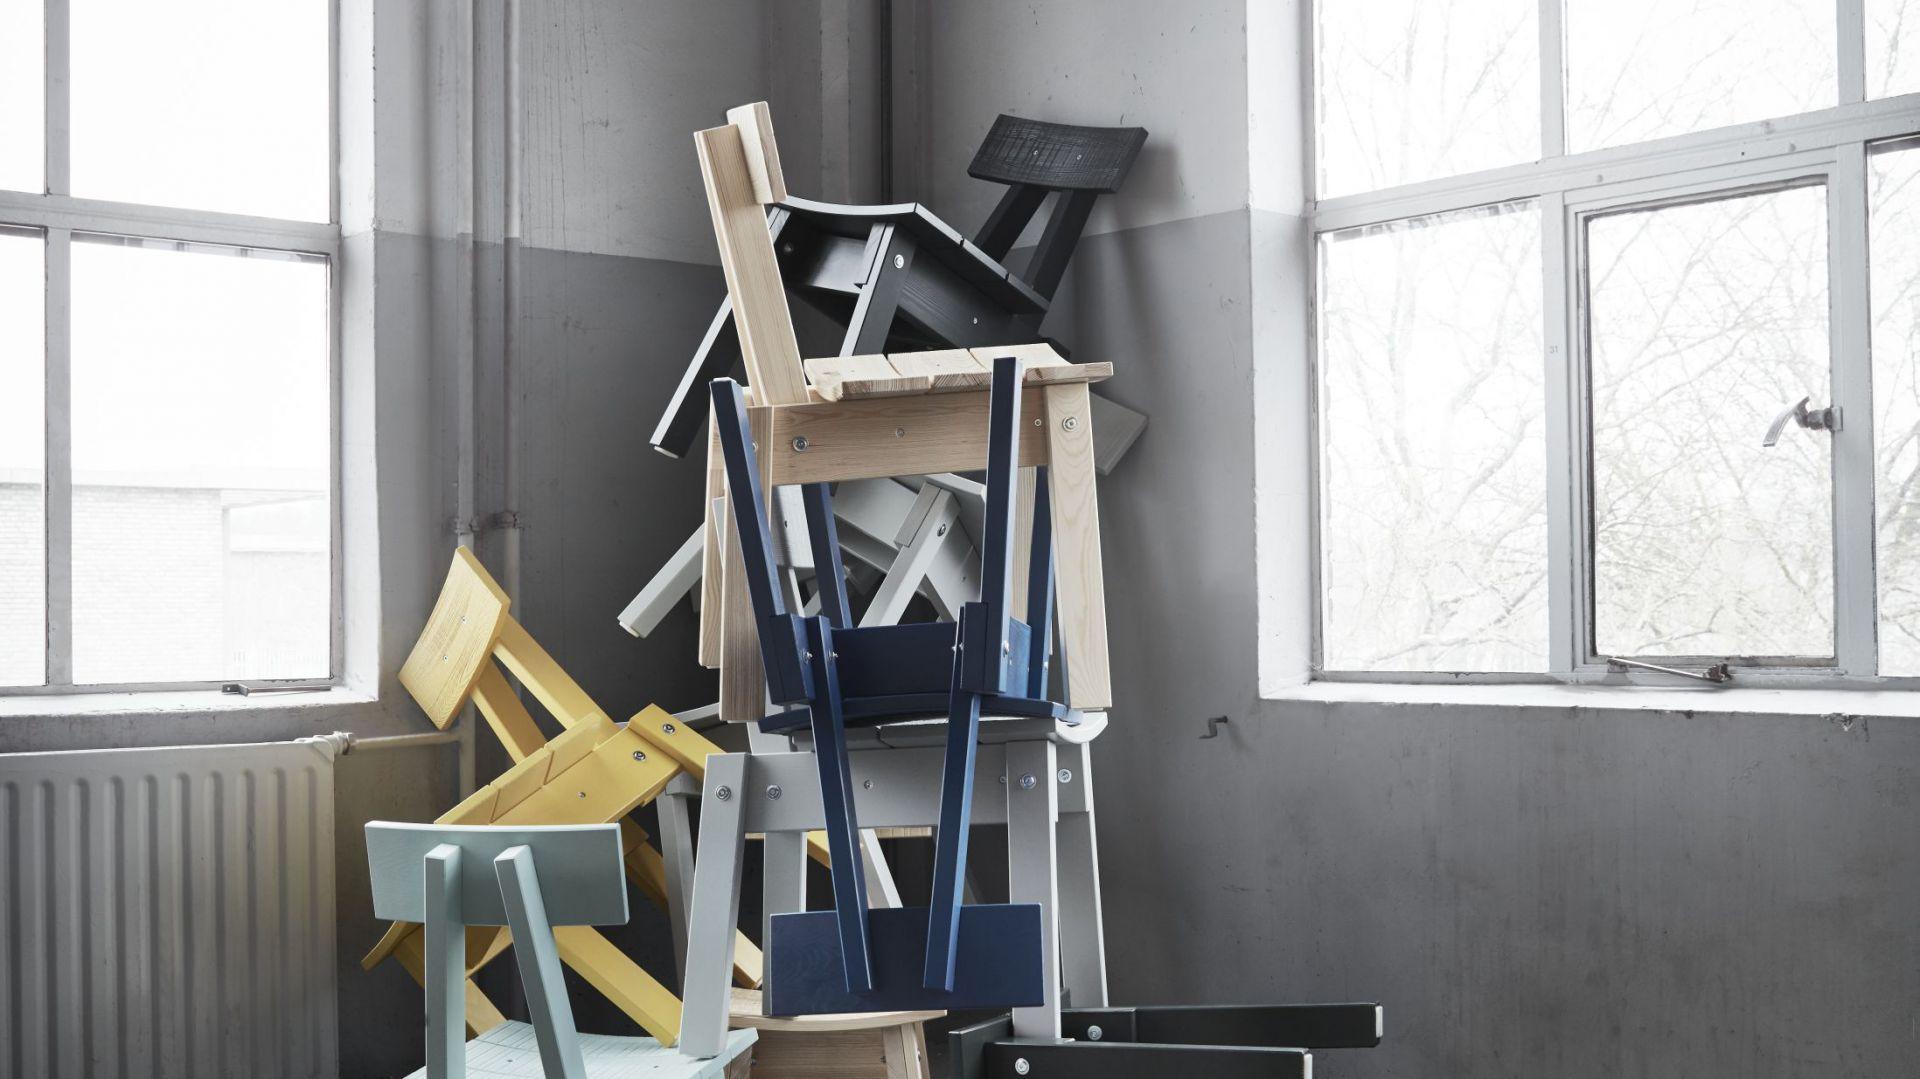 Kolekcja Industriell to efekt współpracy z holenderskim projektantem Pietem Hein Eekiem. Fot. IKEA